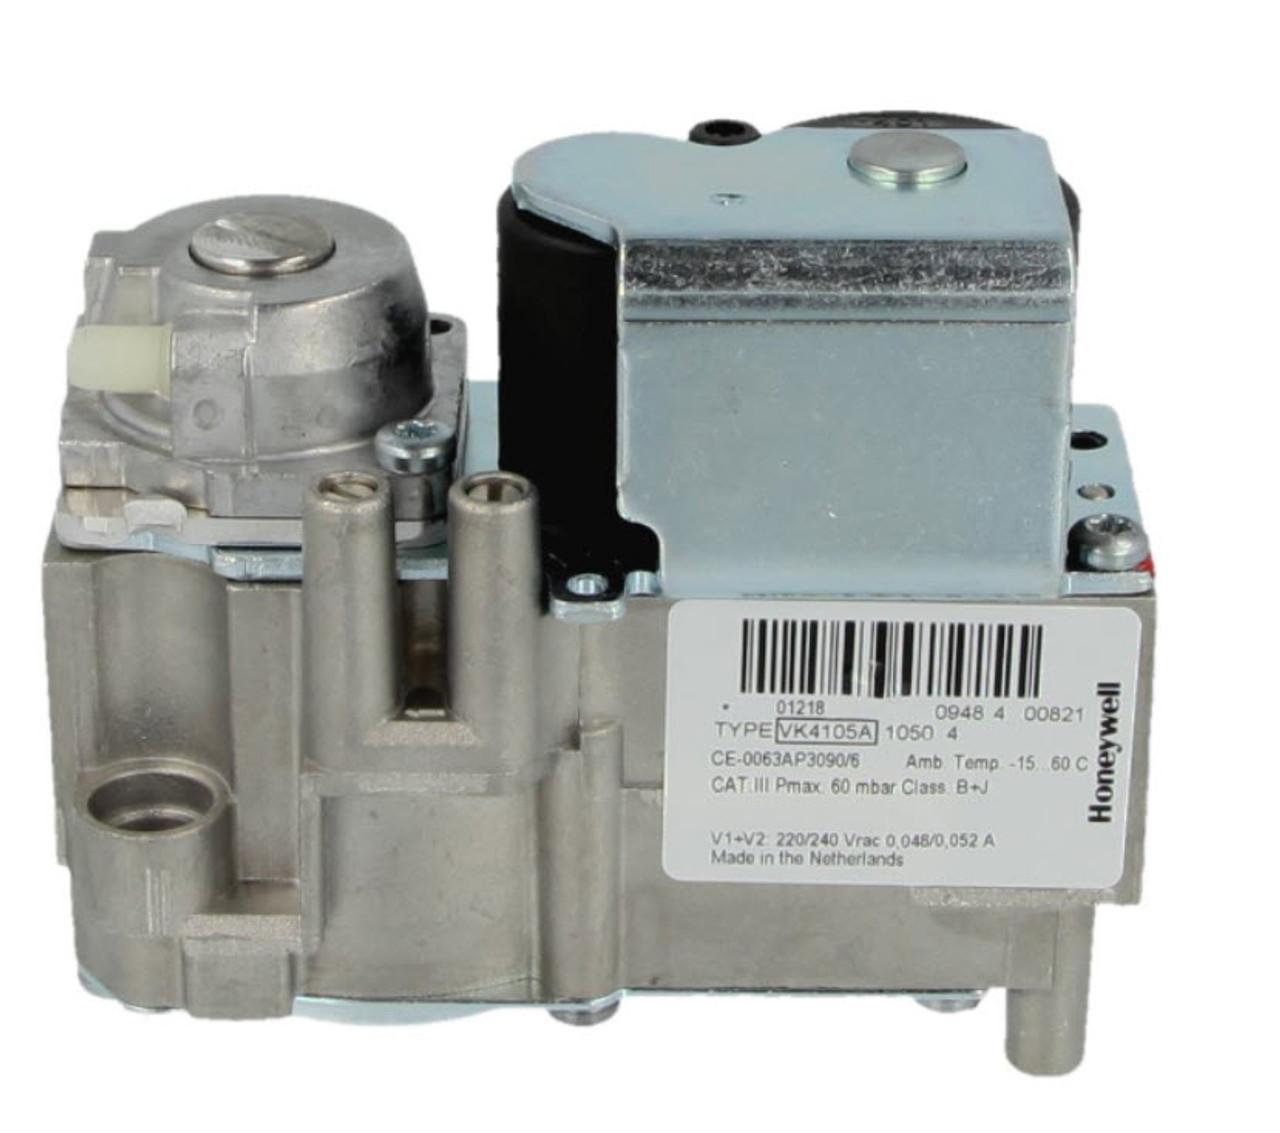 Honeywell VK4105A1050U CVI valve, gas control block